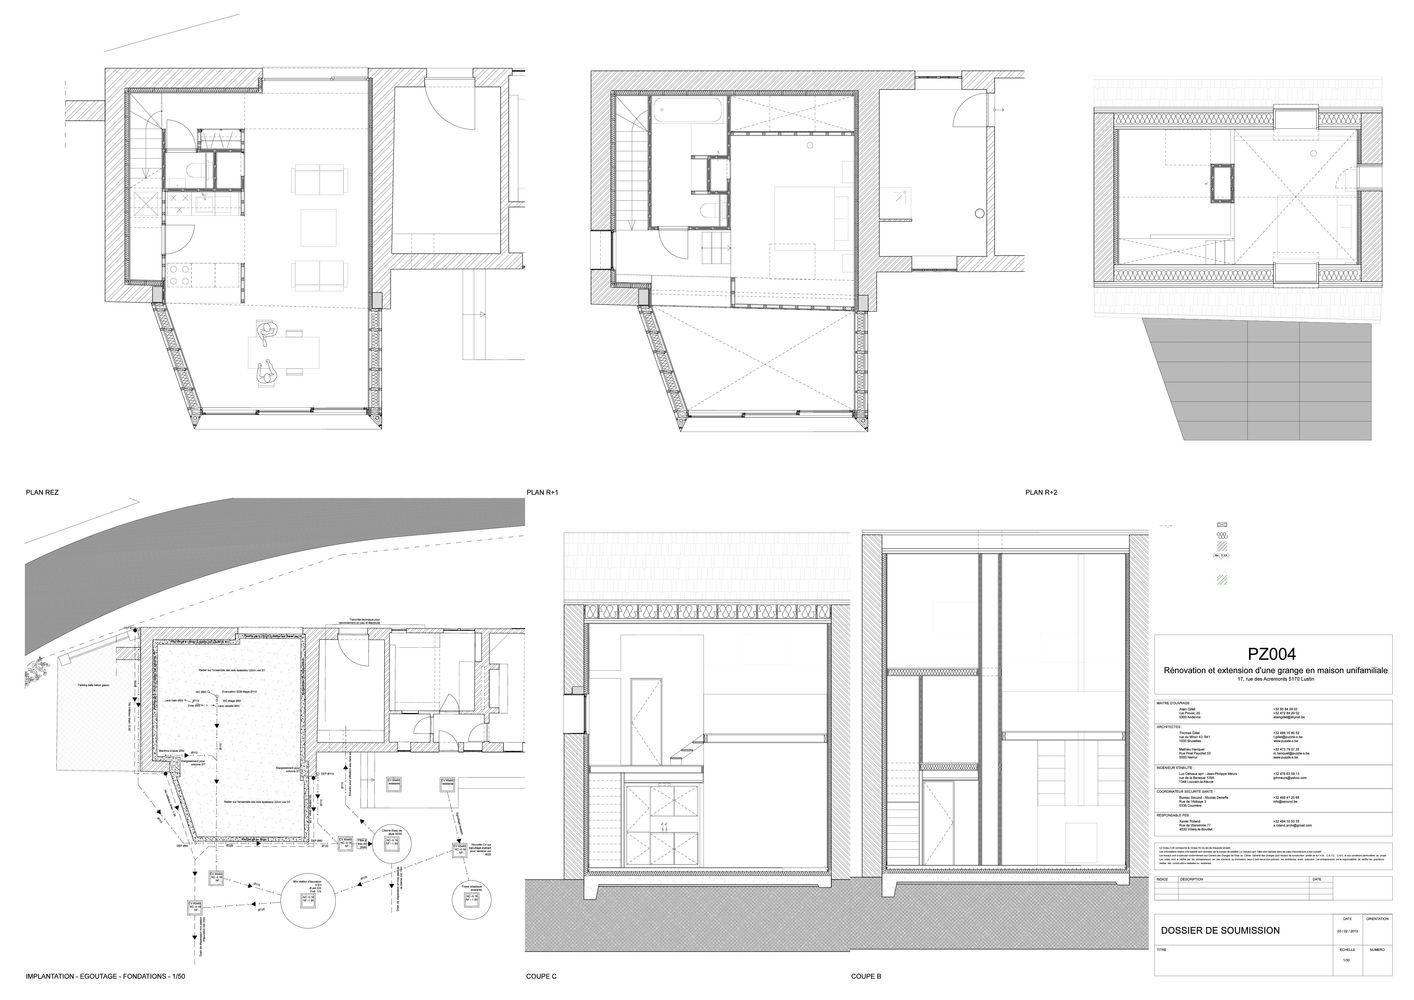 Gallery house extension in lustin puzzles architecture 18 architecture la maison de